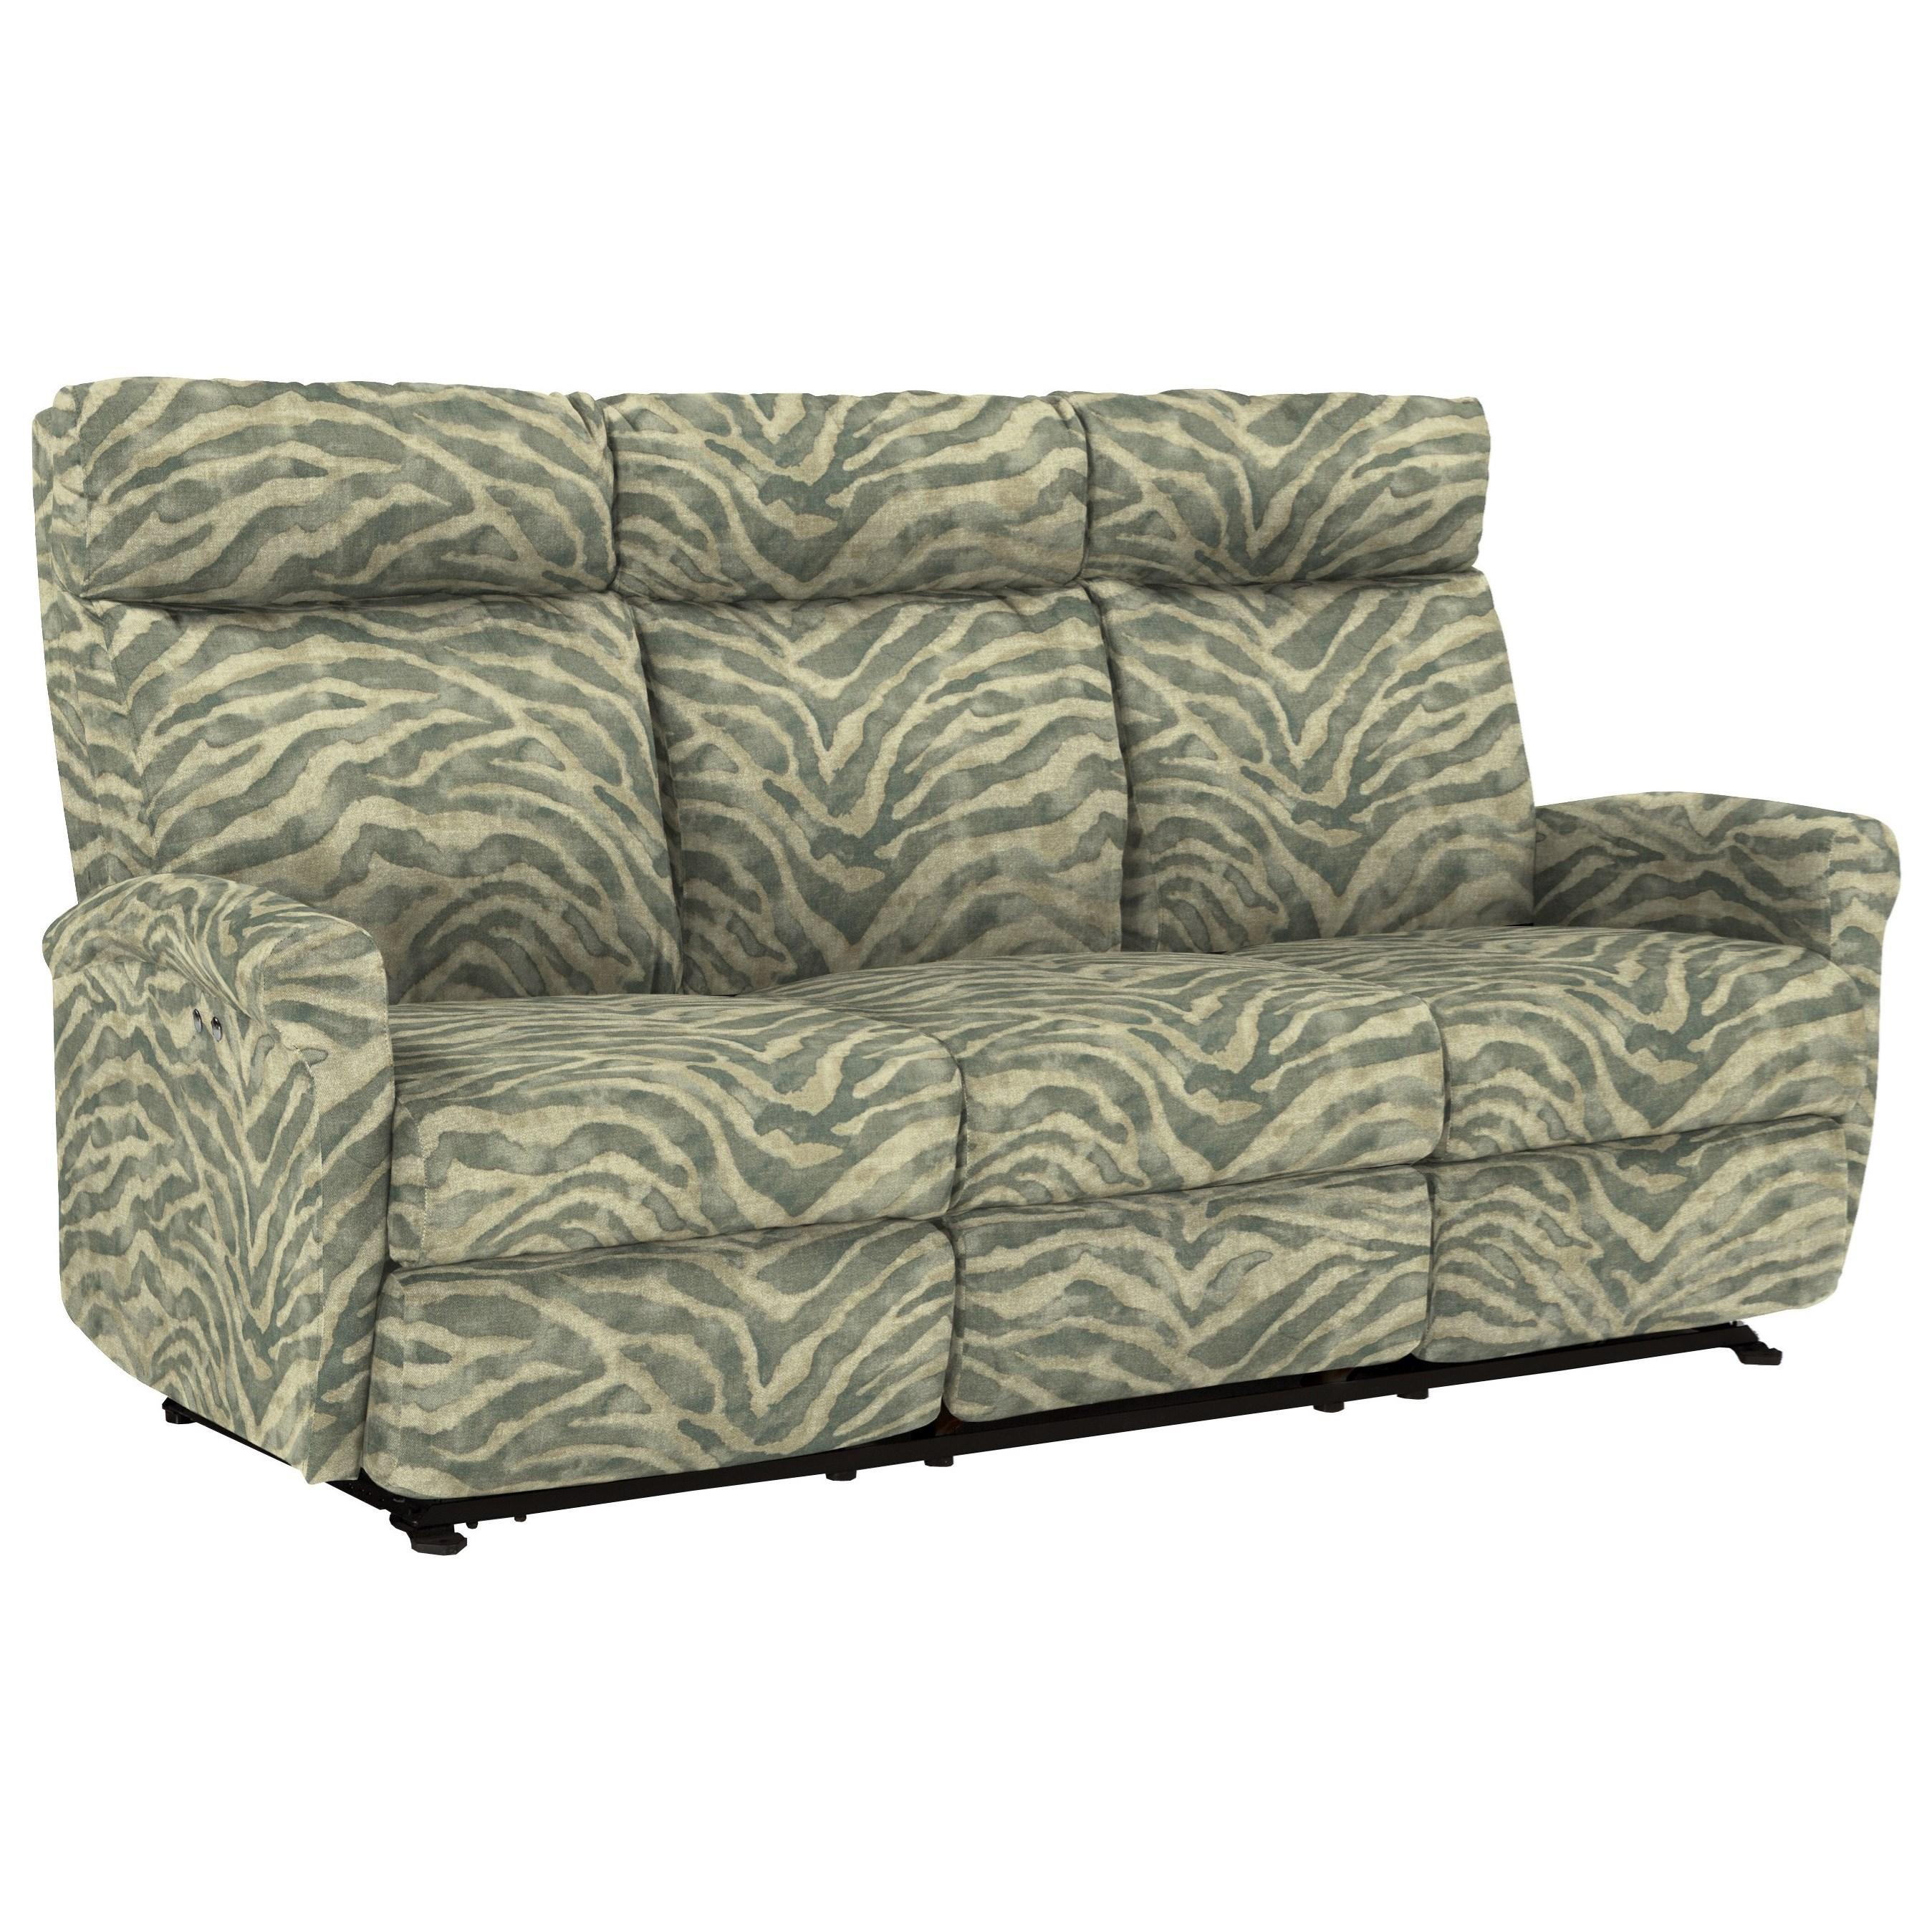 Best Home Furnishings Codie Reclining Sofa - Item Number: 1002935112-35813